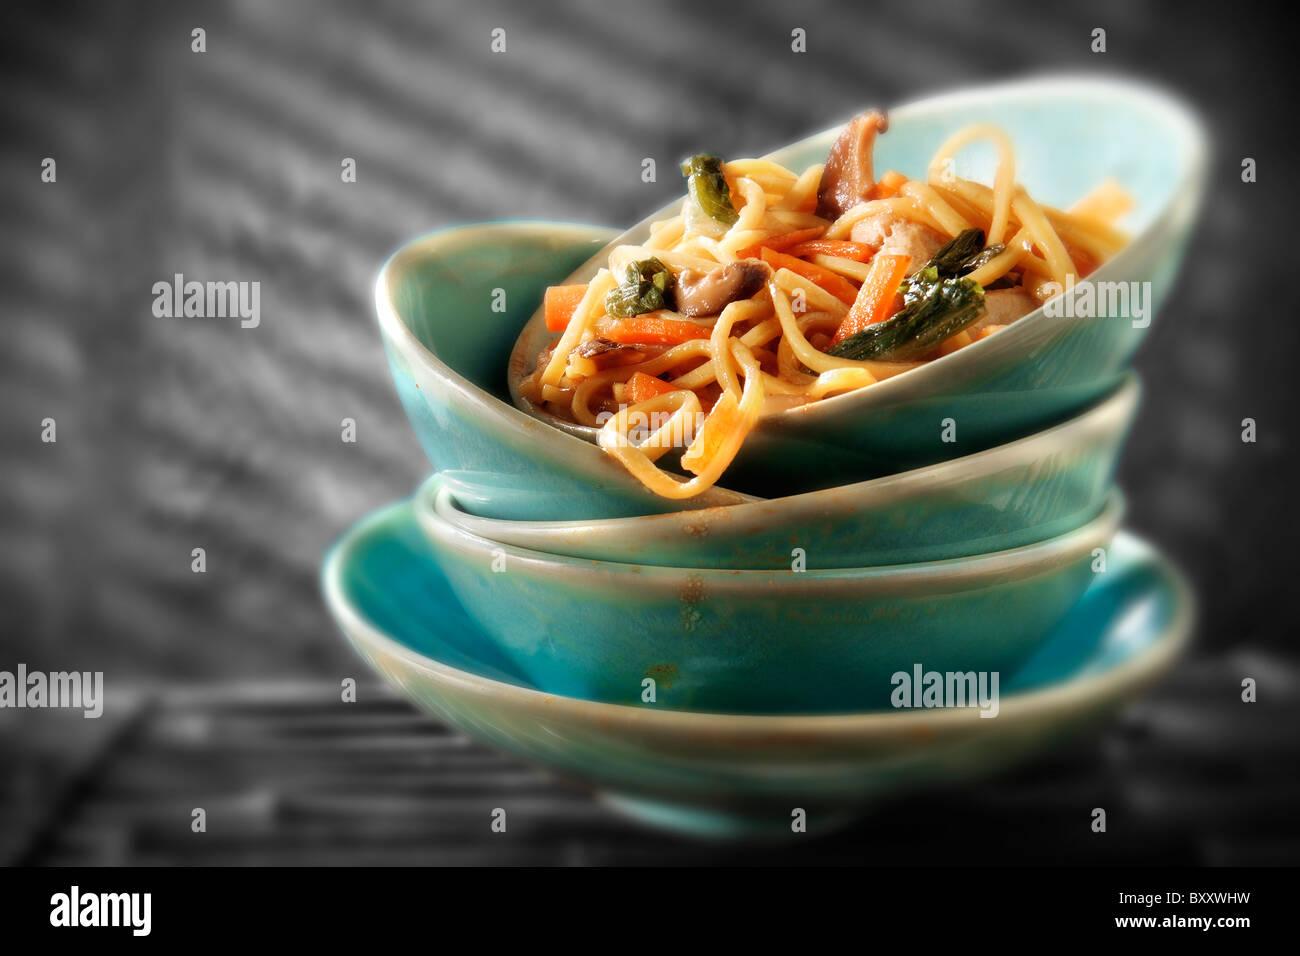 Chinese Stir fried vegetables & noodles - Stock Image